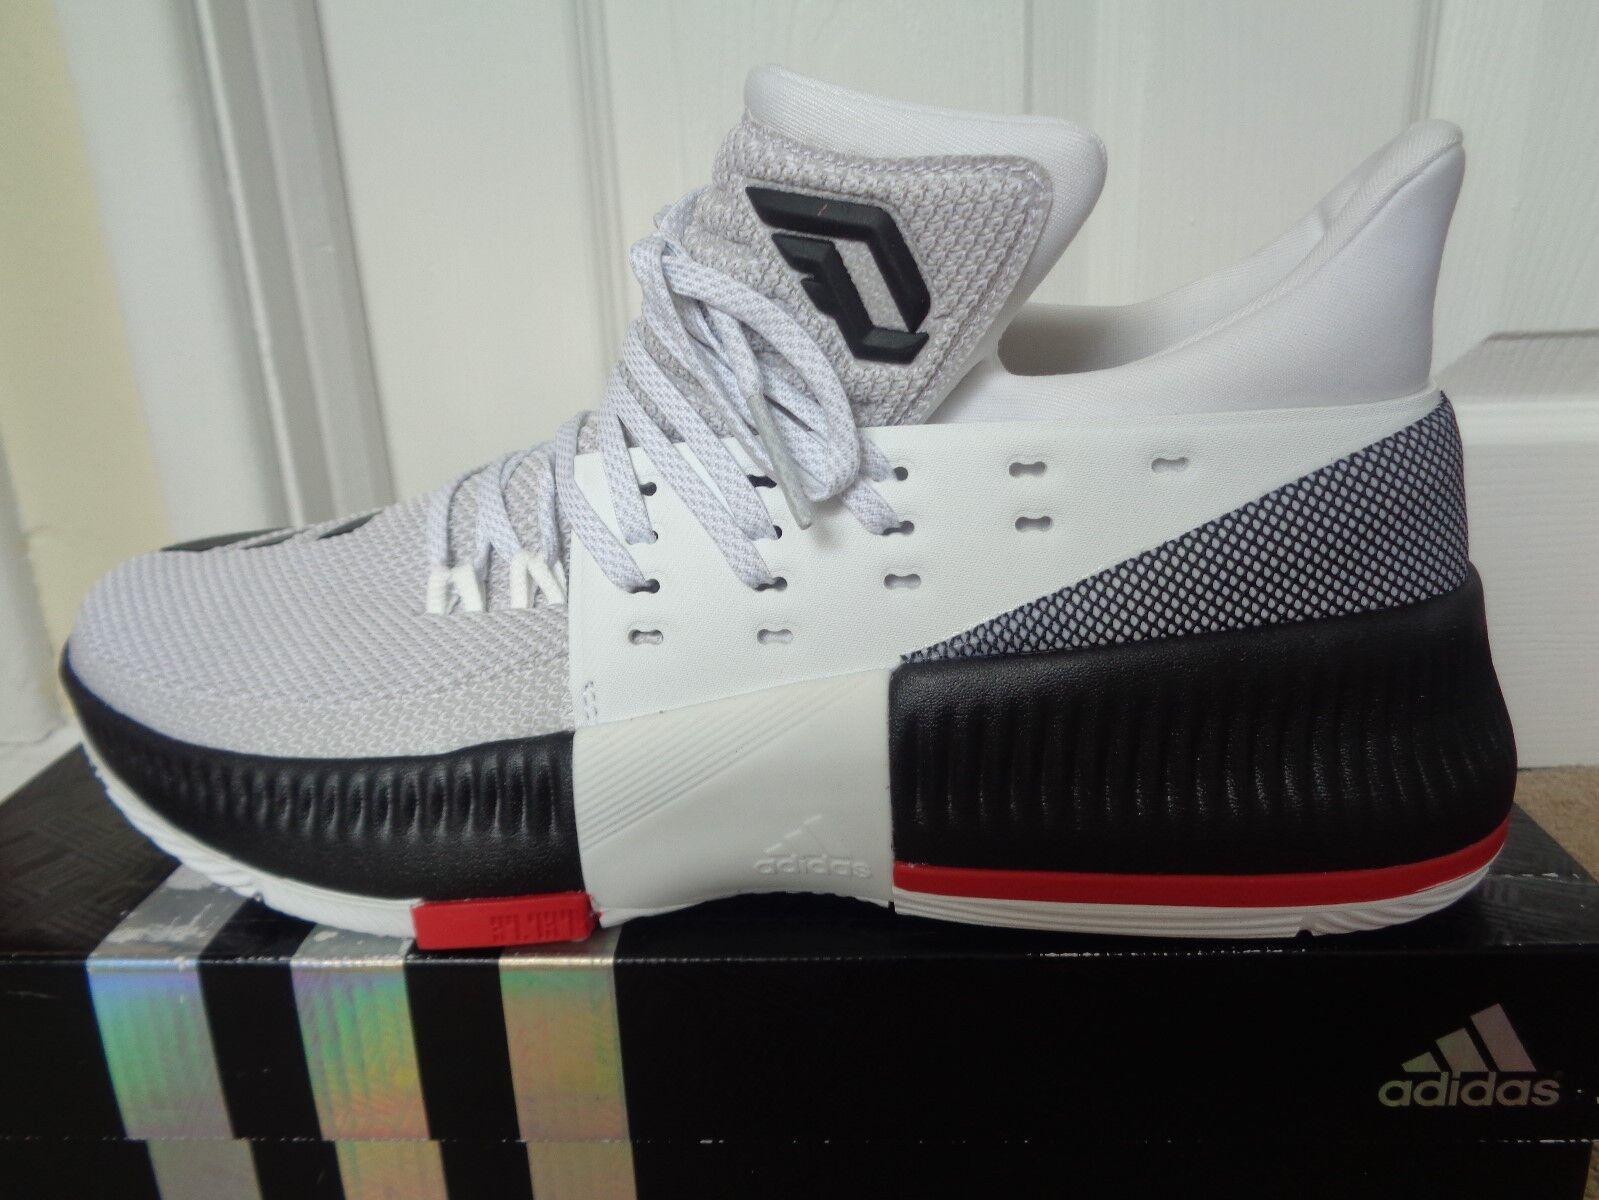 Adidas D Lillard 3 trainers sneakers chaussures BB8268 uk 9 eu 43 1/3 us 9.5 NEW+BOX